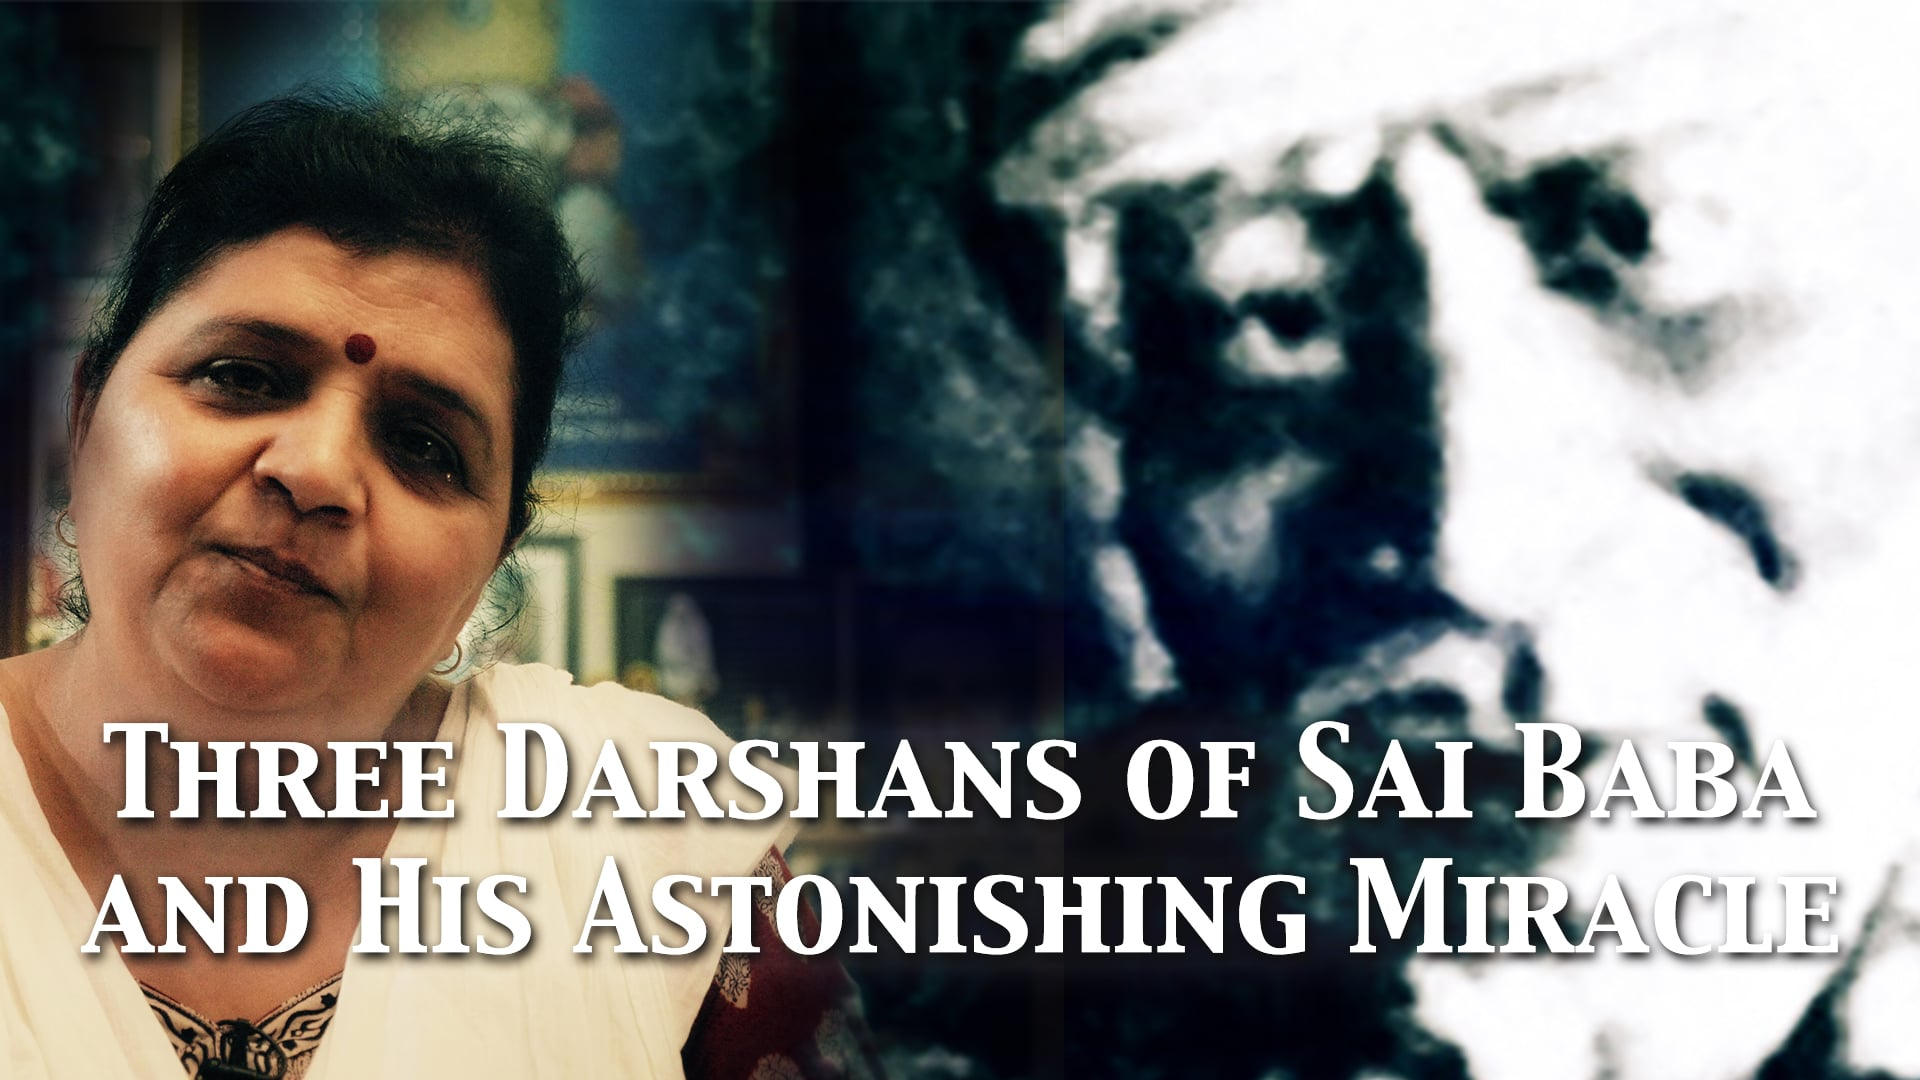 Three Darshans of Baba and His Astonishing Miracle